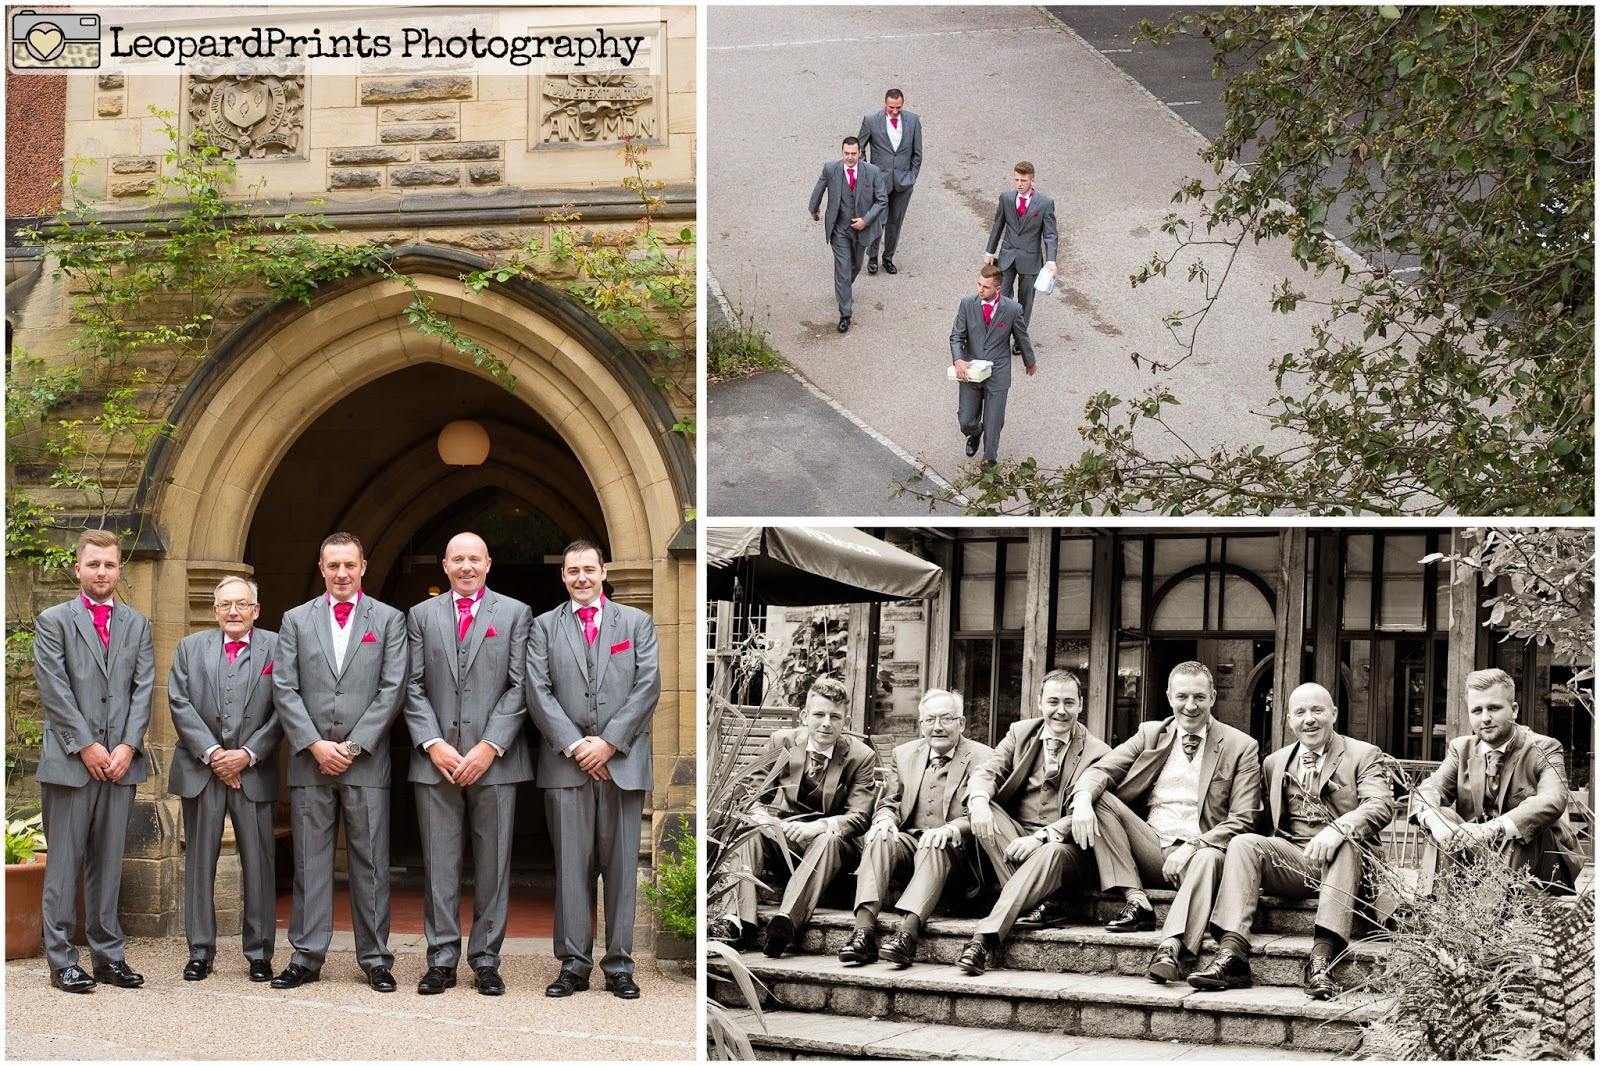 Wedding Chair Covers Newcastle Upon Tyne Office Overstock Leopardprints Weddings: Photographer At Jesmond Dene House